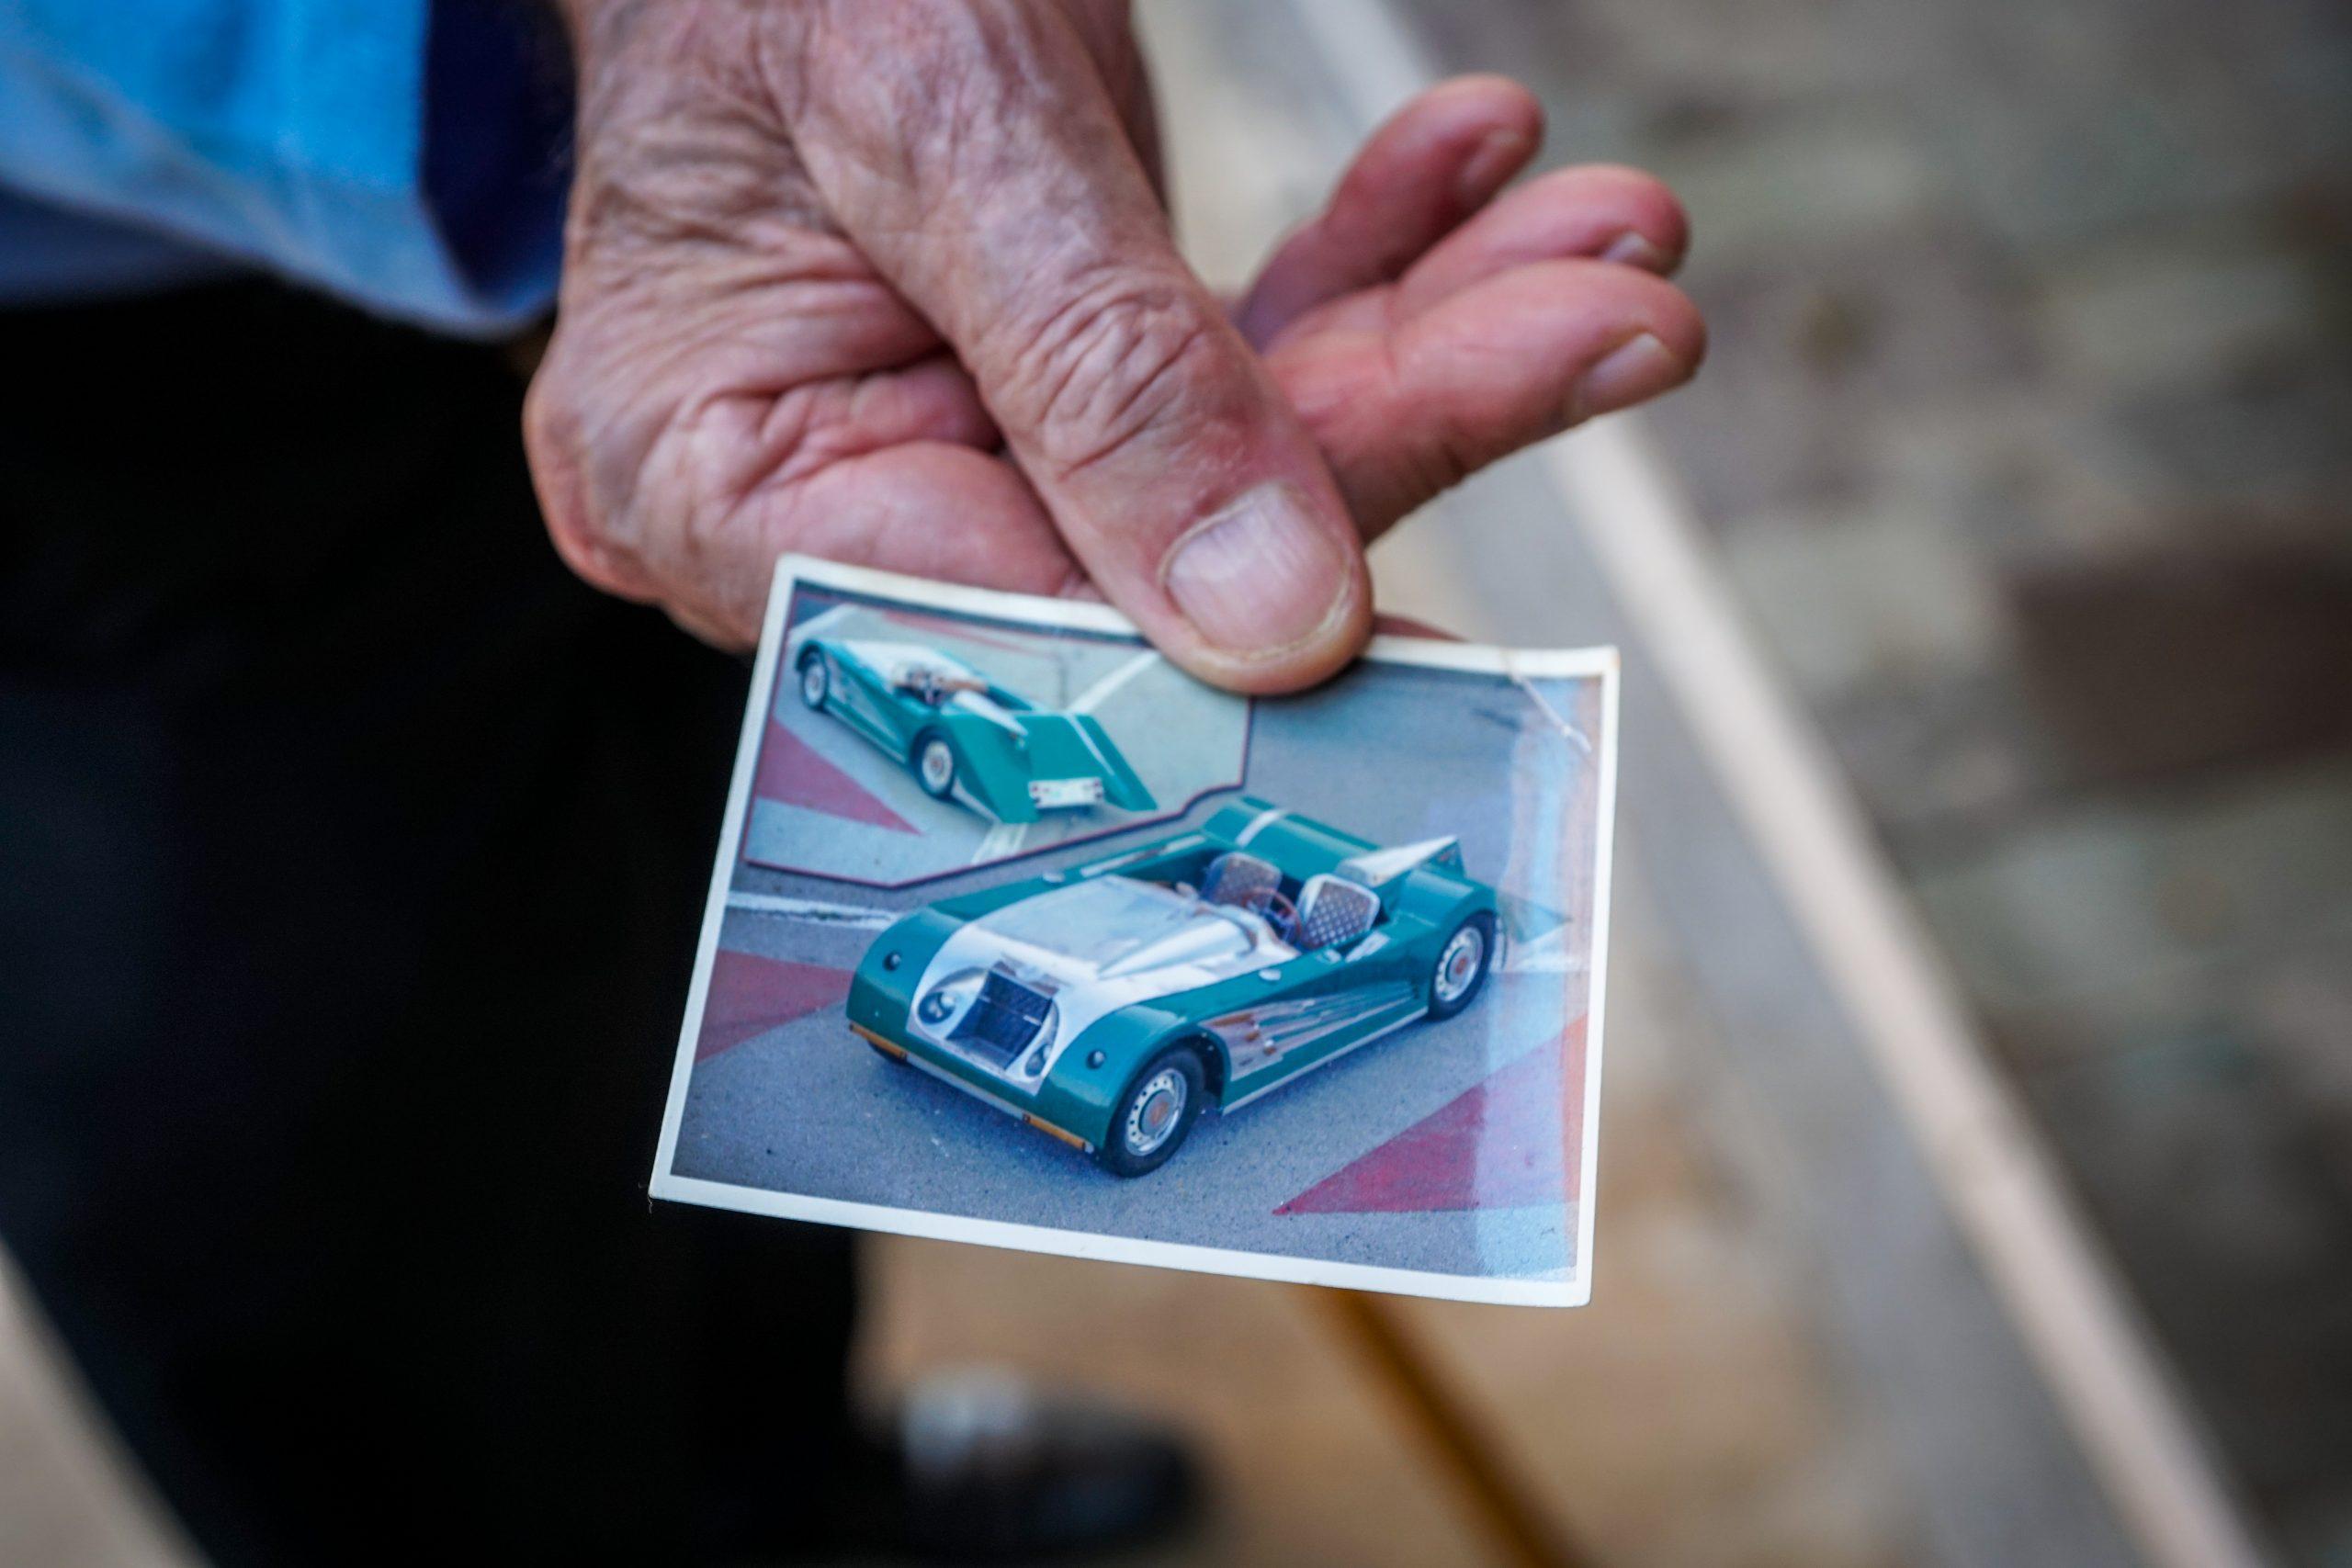 Toly Arutunoff Michel Pistol bespoke Fiat polaroid